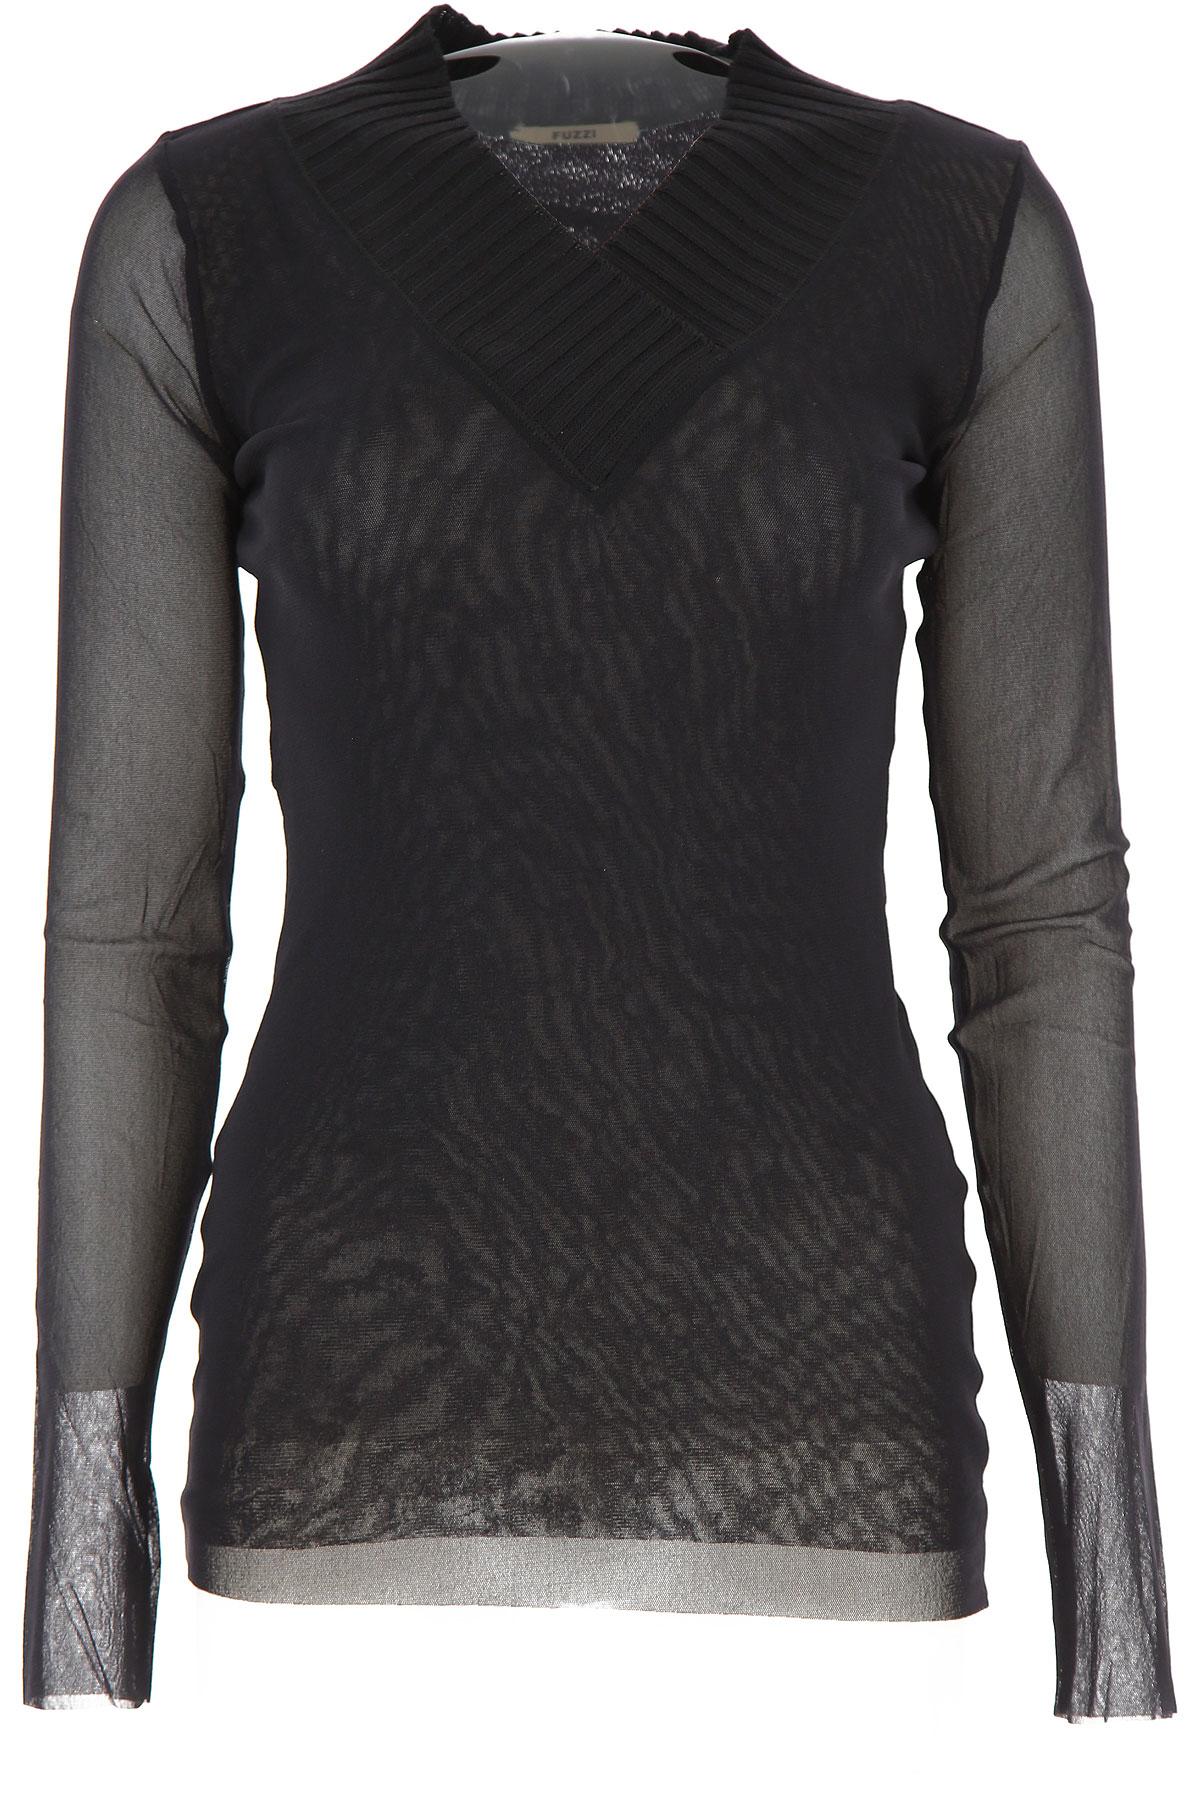 Fuzzi Sweater for Women Jumper On Sale, Black, polyamide, 2019, 4 6 8